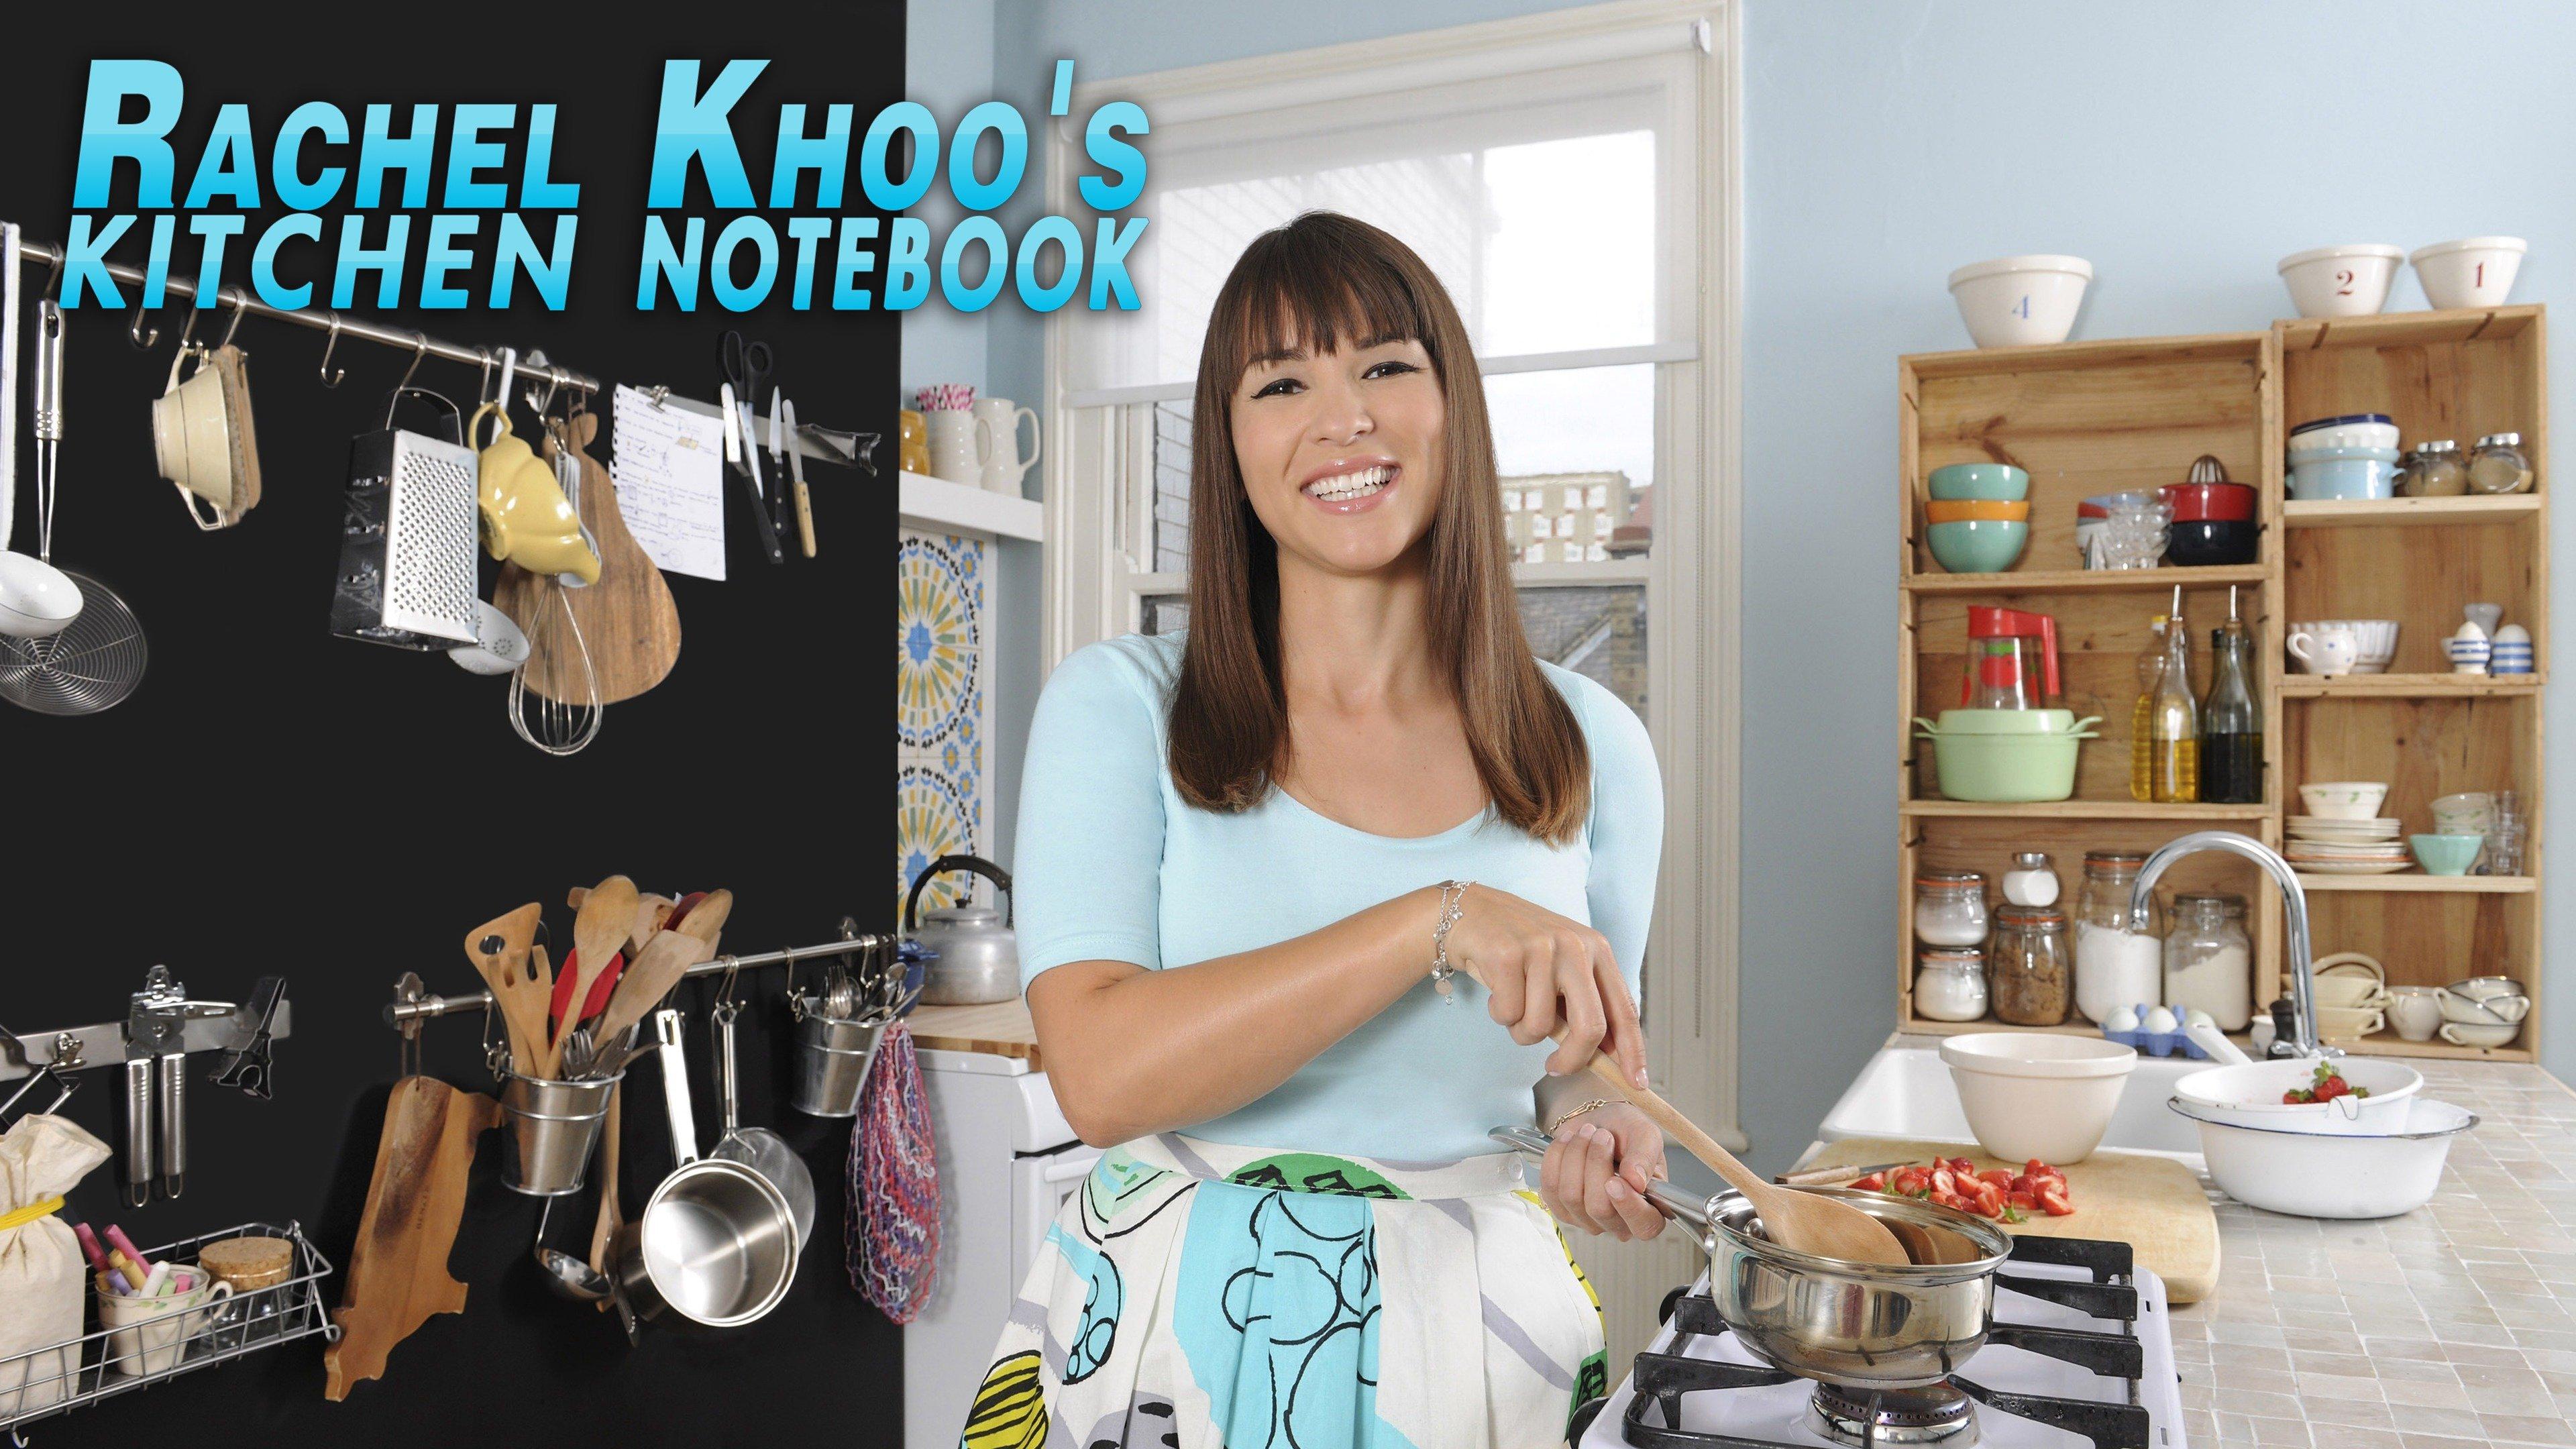 Rachel Khoo's Kitchen Notebook